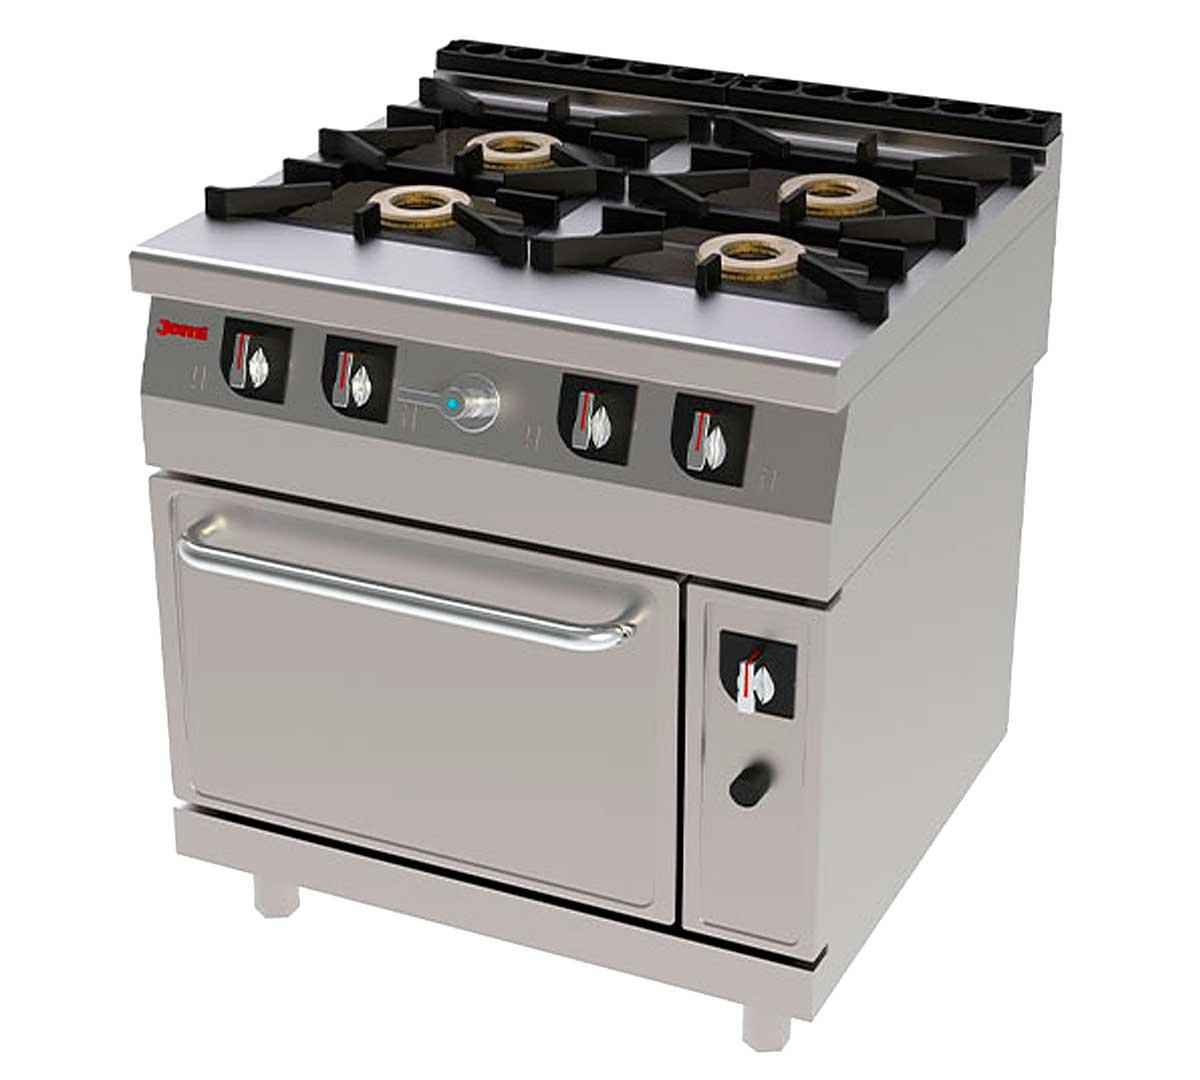 Cocina jemi serie 750 chef horno - Fogones a gas ...